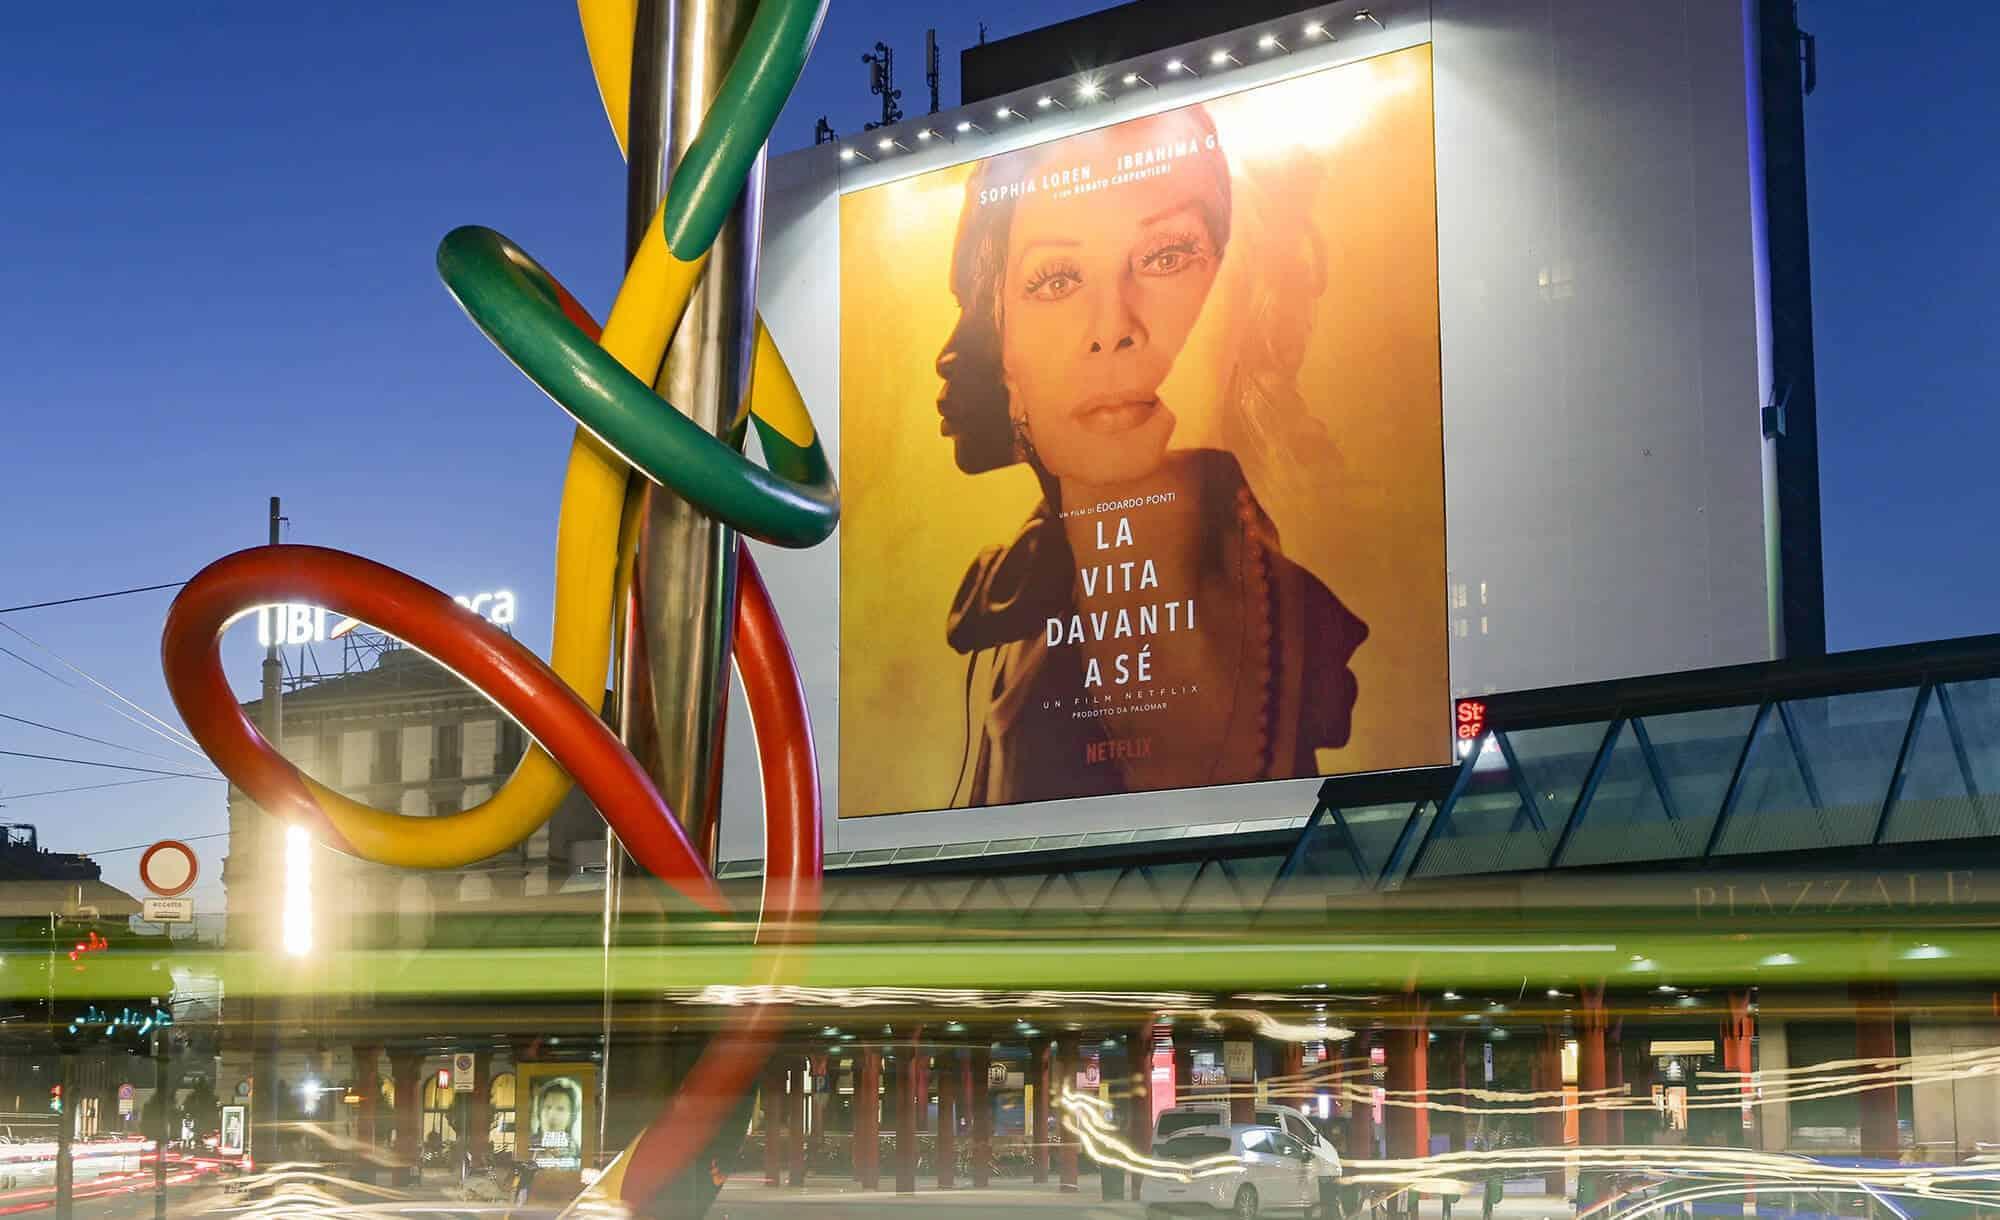 Maxi Affissione a Milano in Piazza Cadorna di Netflix (movie)